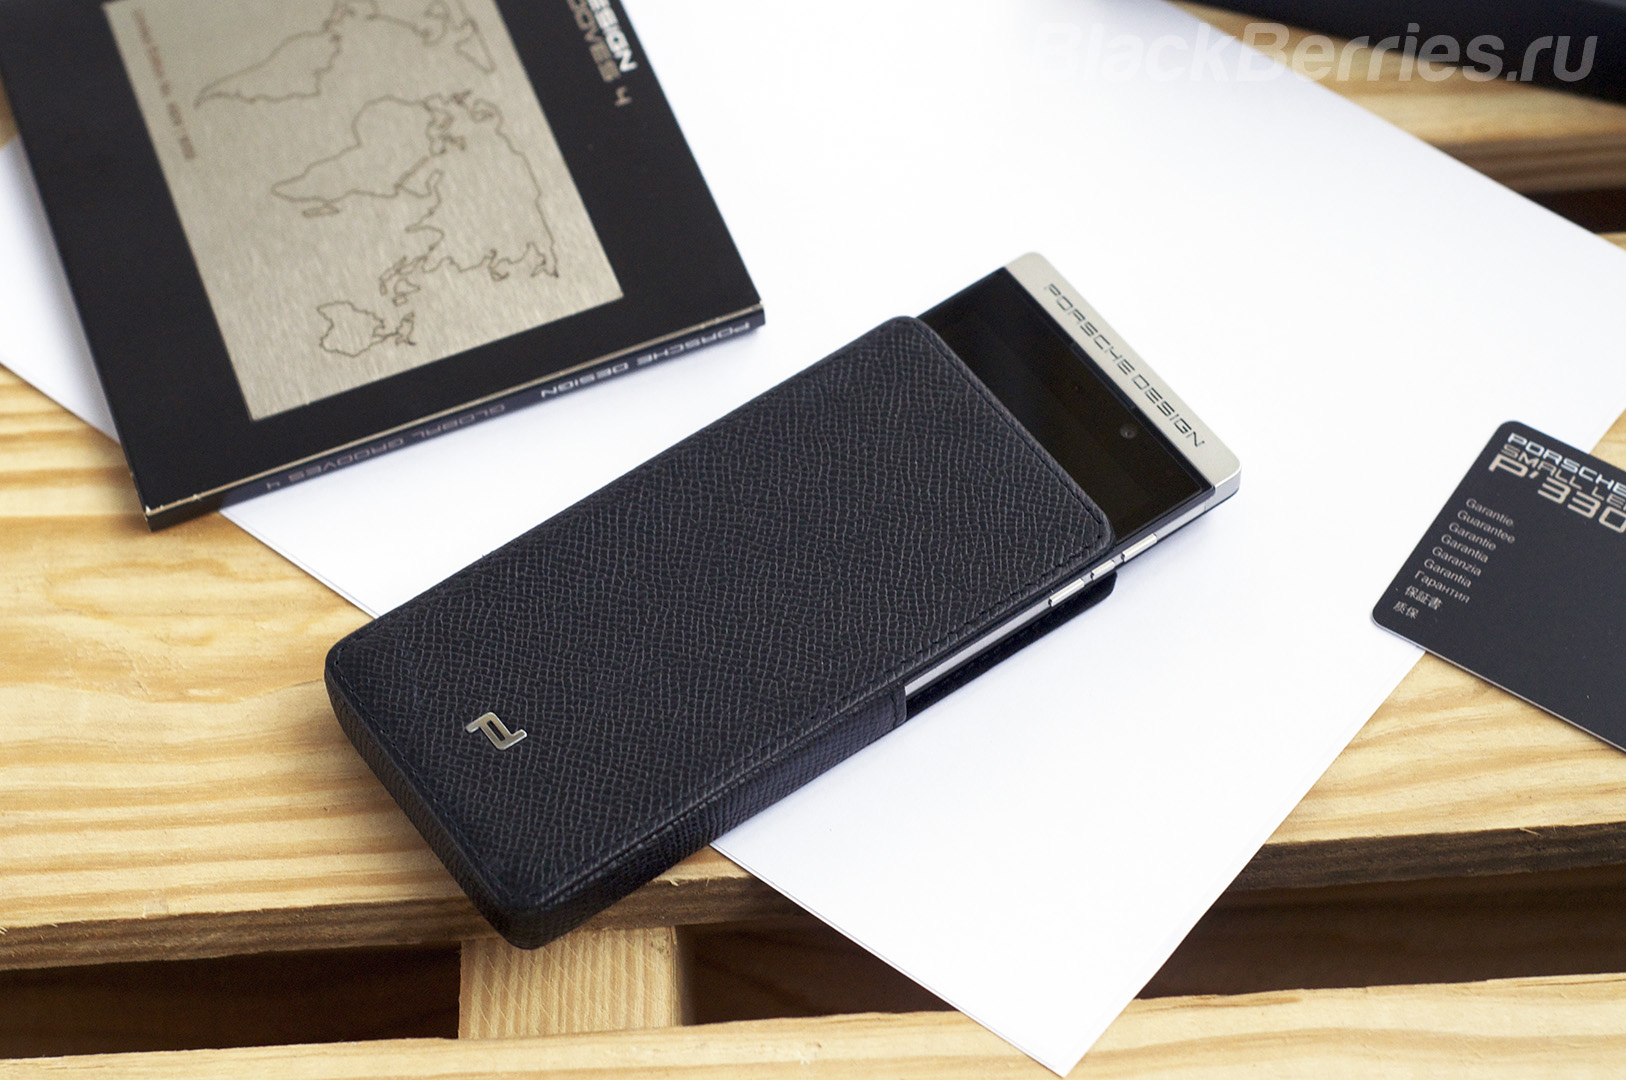 blackberry-porsche-design-case-covers-04